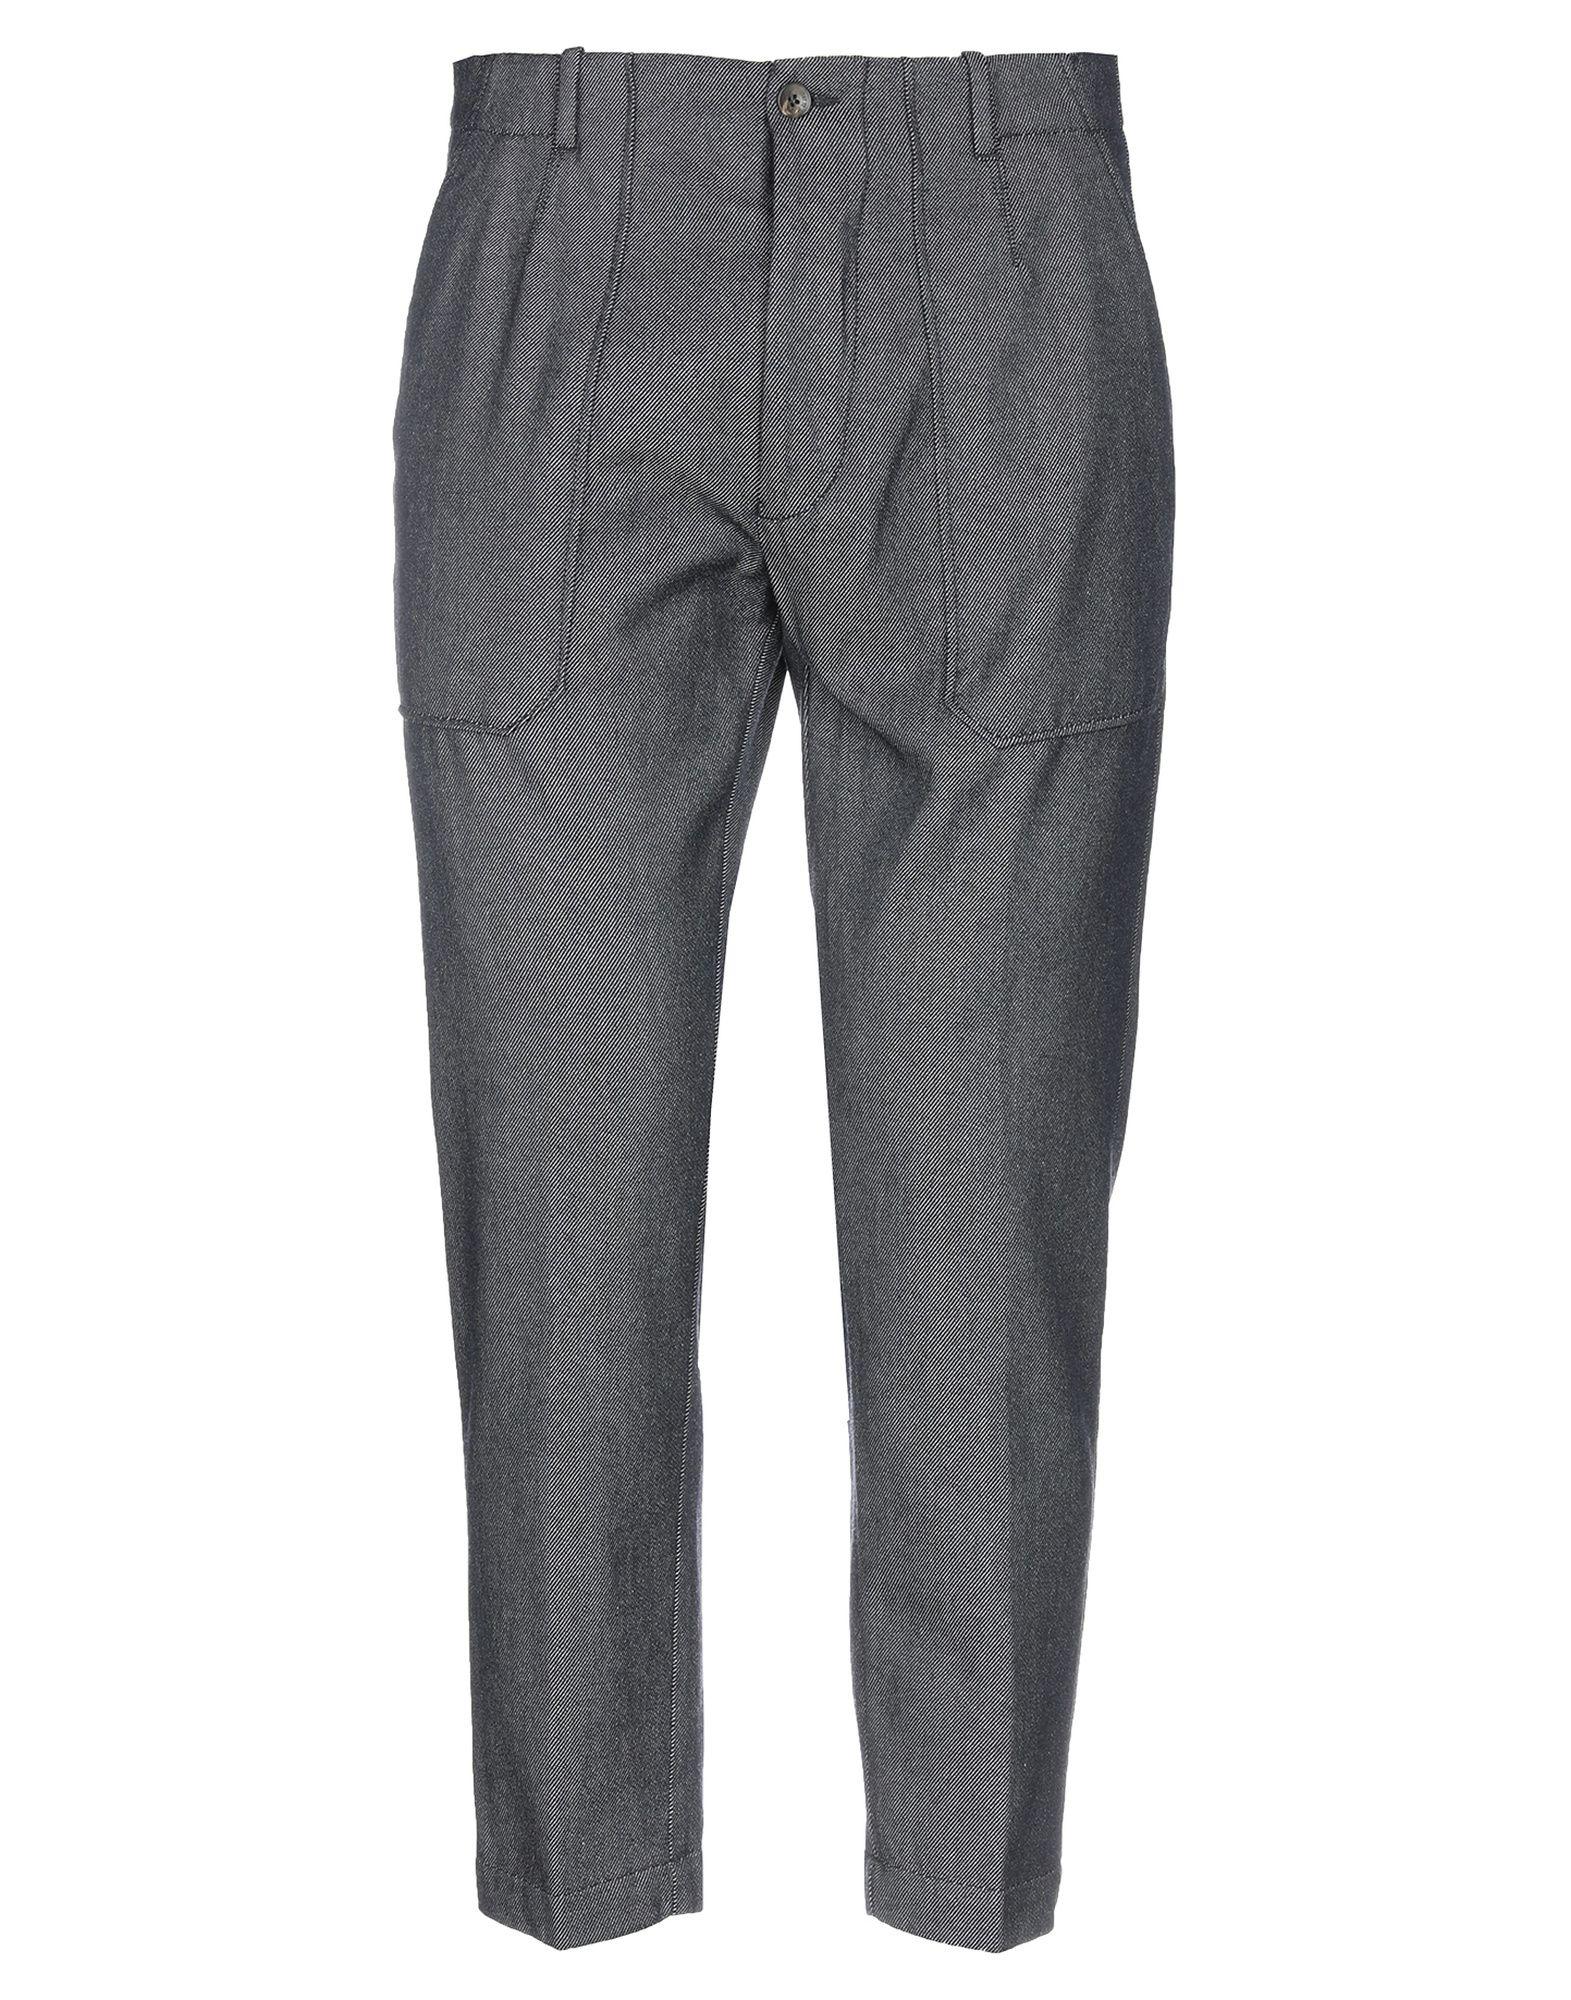 NOT TO BE FOUND Повседневные брюки to be too повседневные брюки